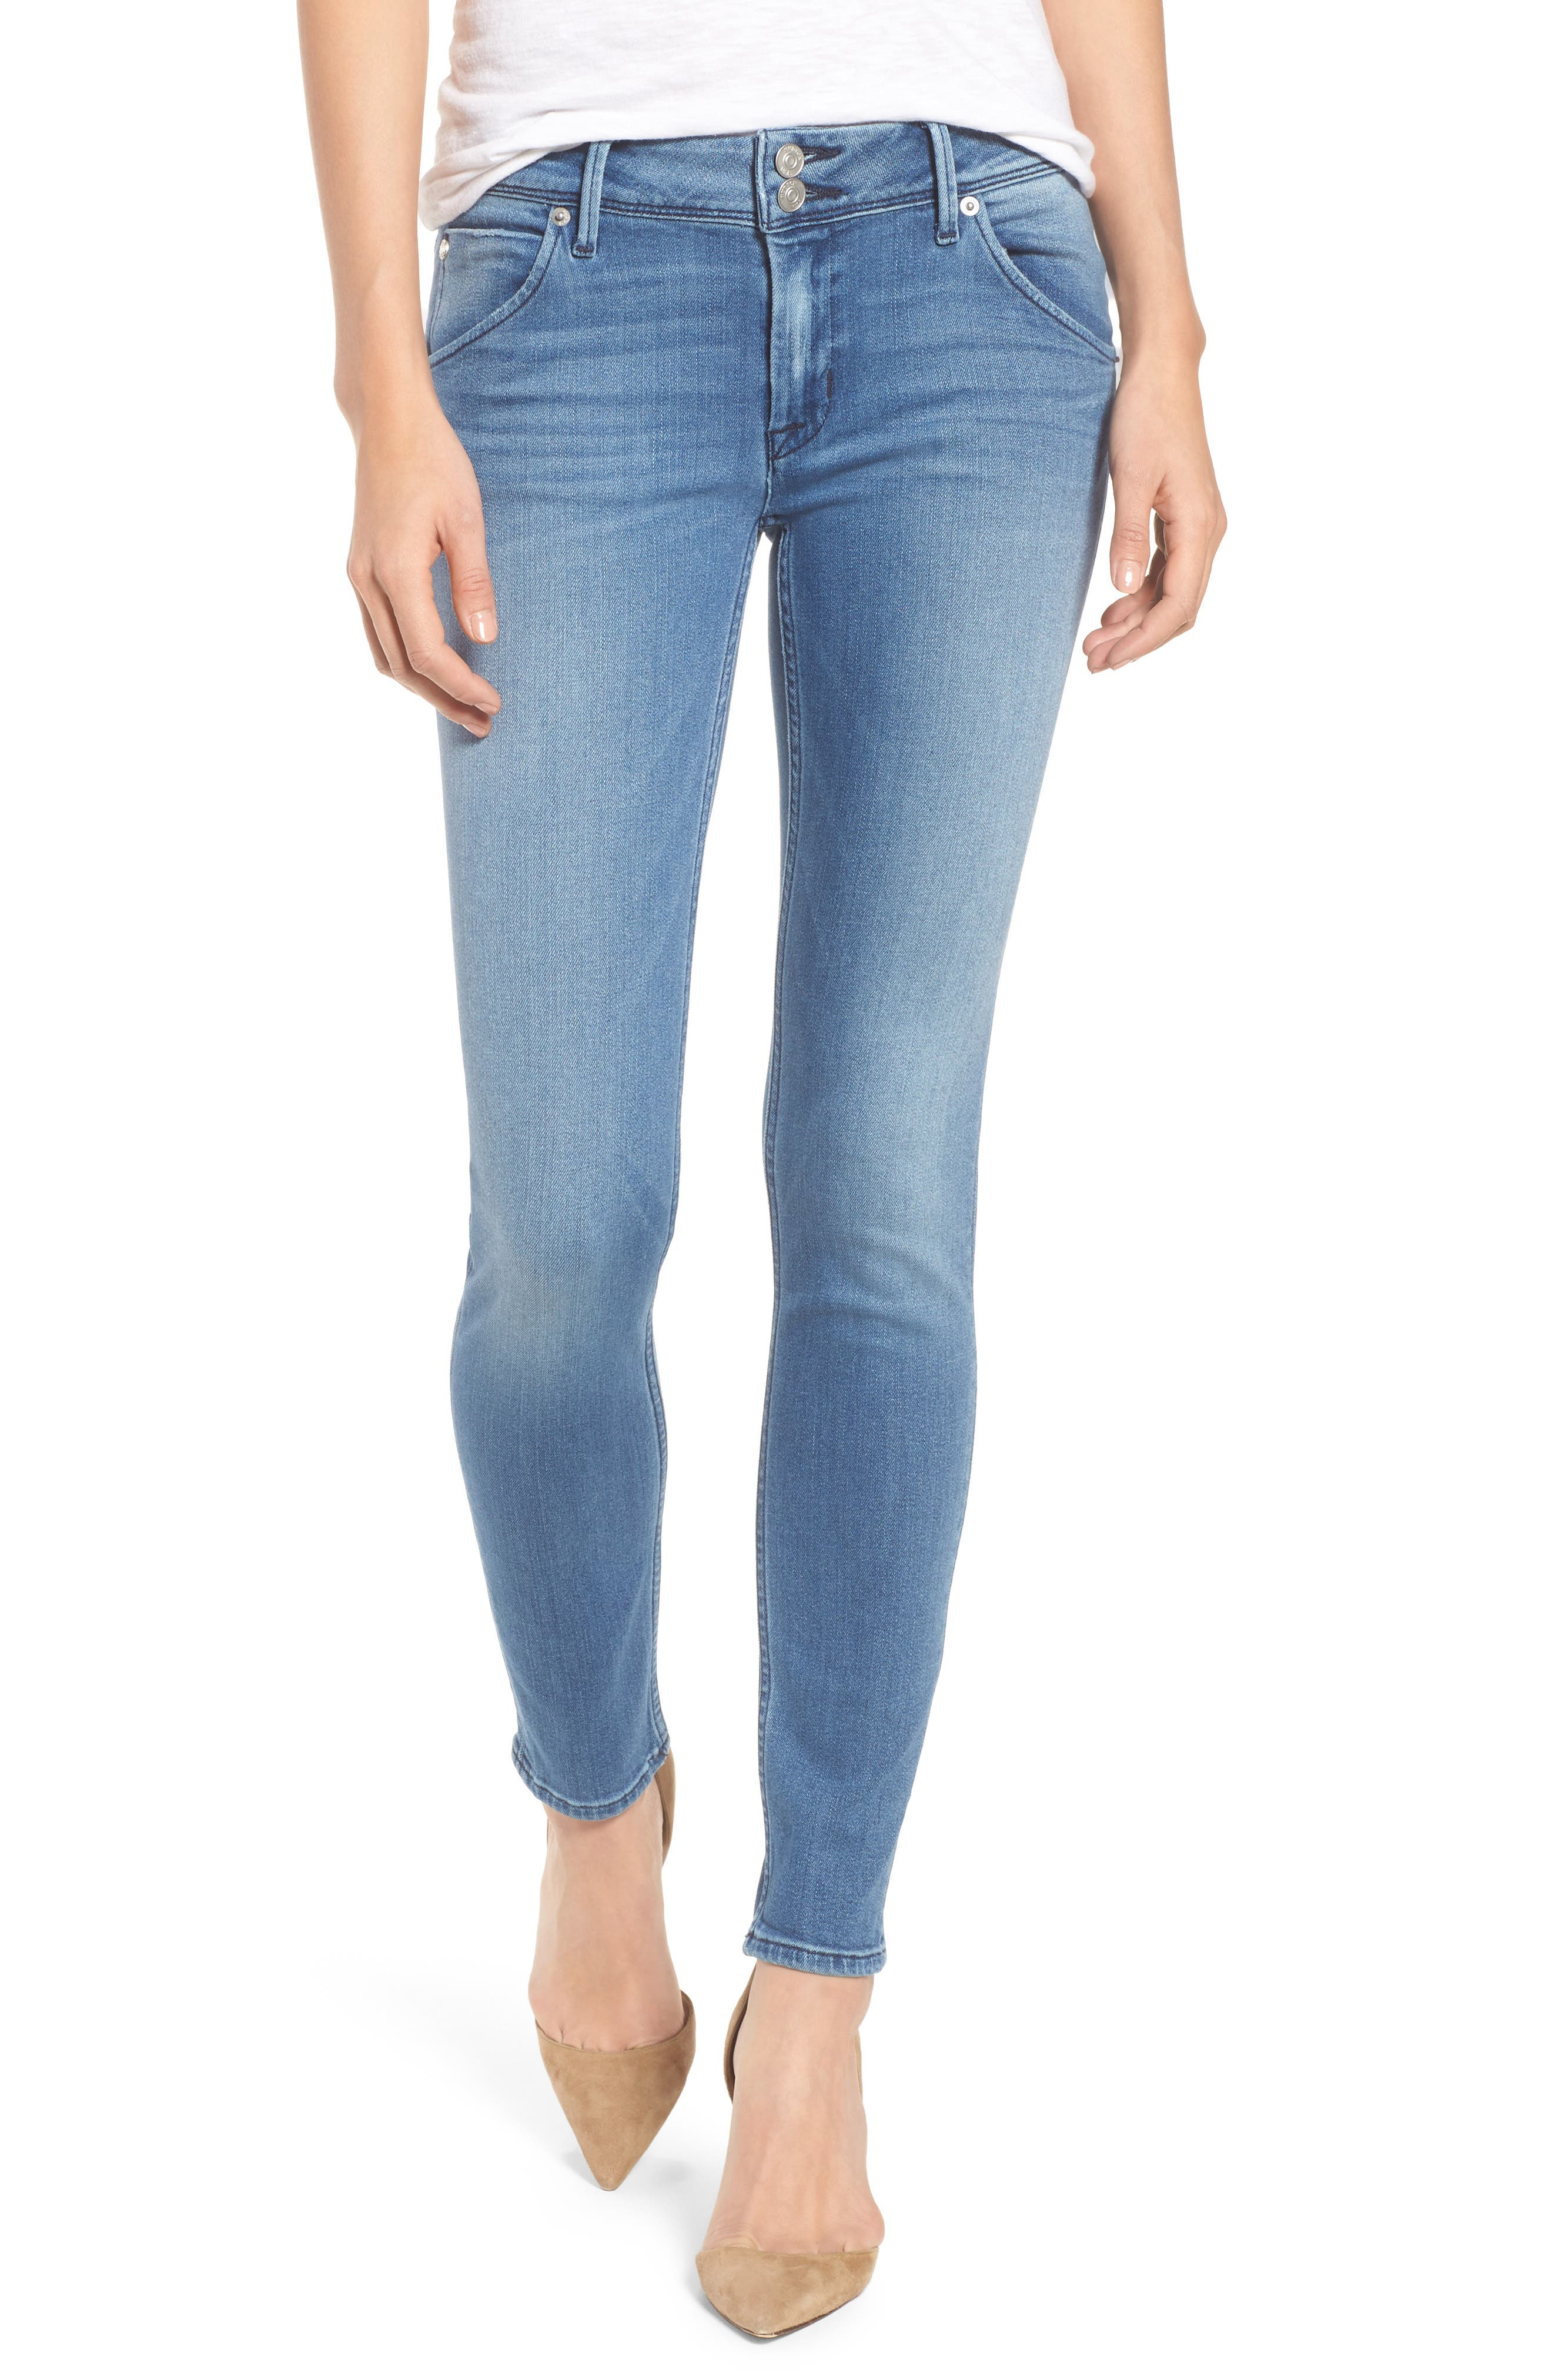 Main Image - Hudson Jeans Collin Skinny Jeans (Sentimental)